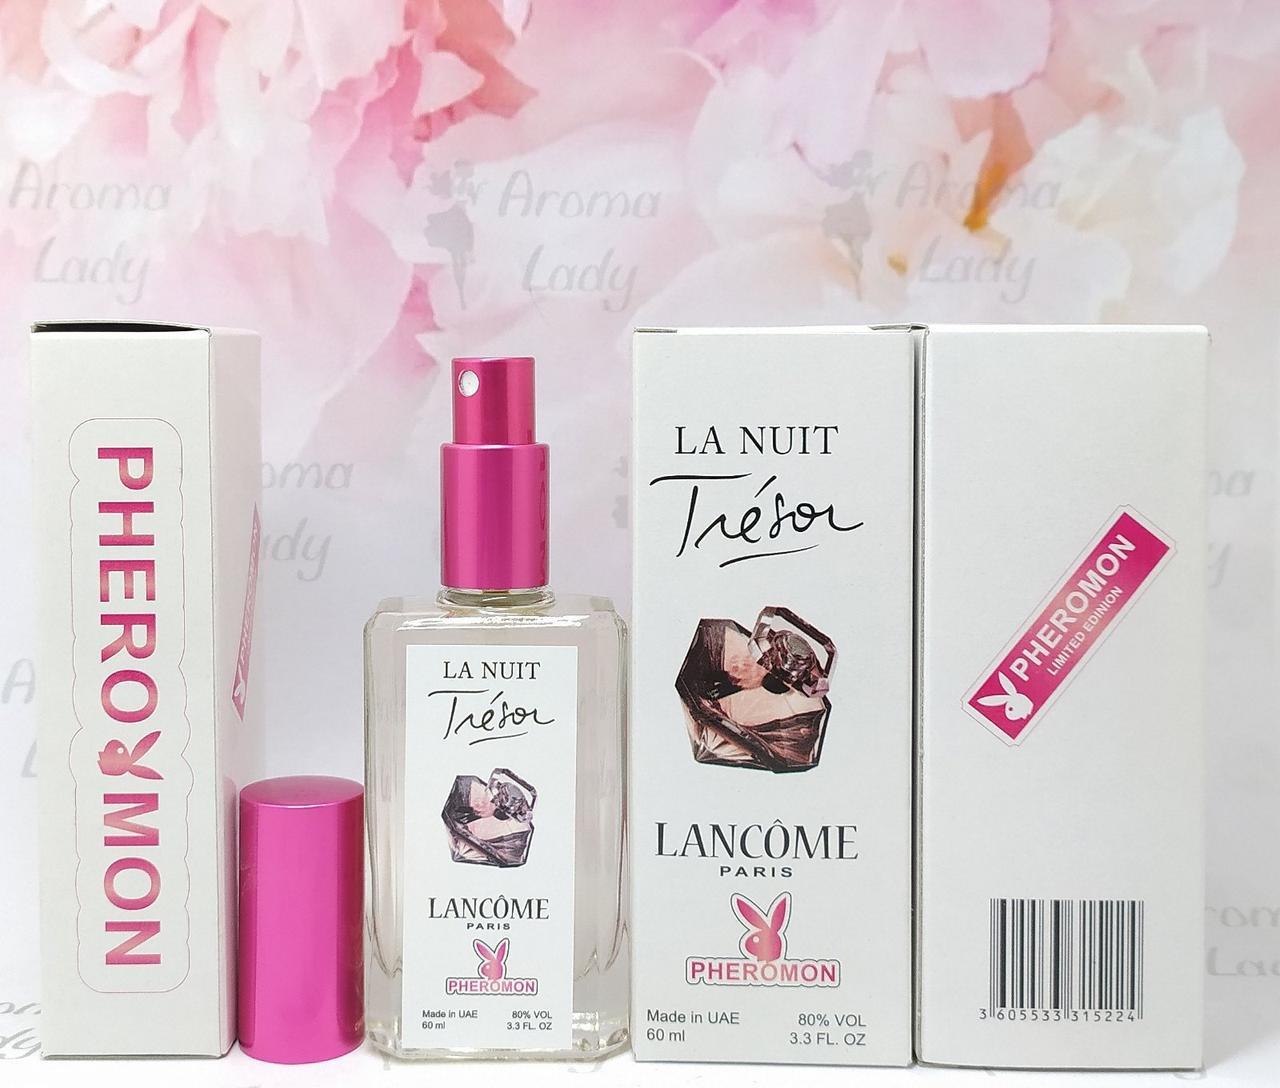 Женский аромат Lancome La Nuit Tresor (Ланком Ля Нуи Трезор) с феромонами 60 мл